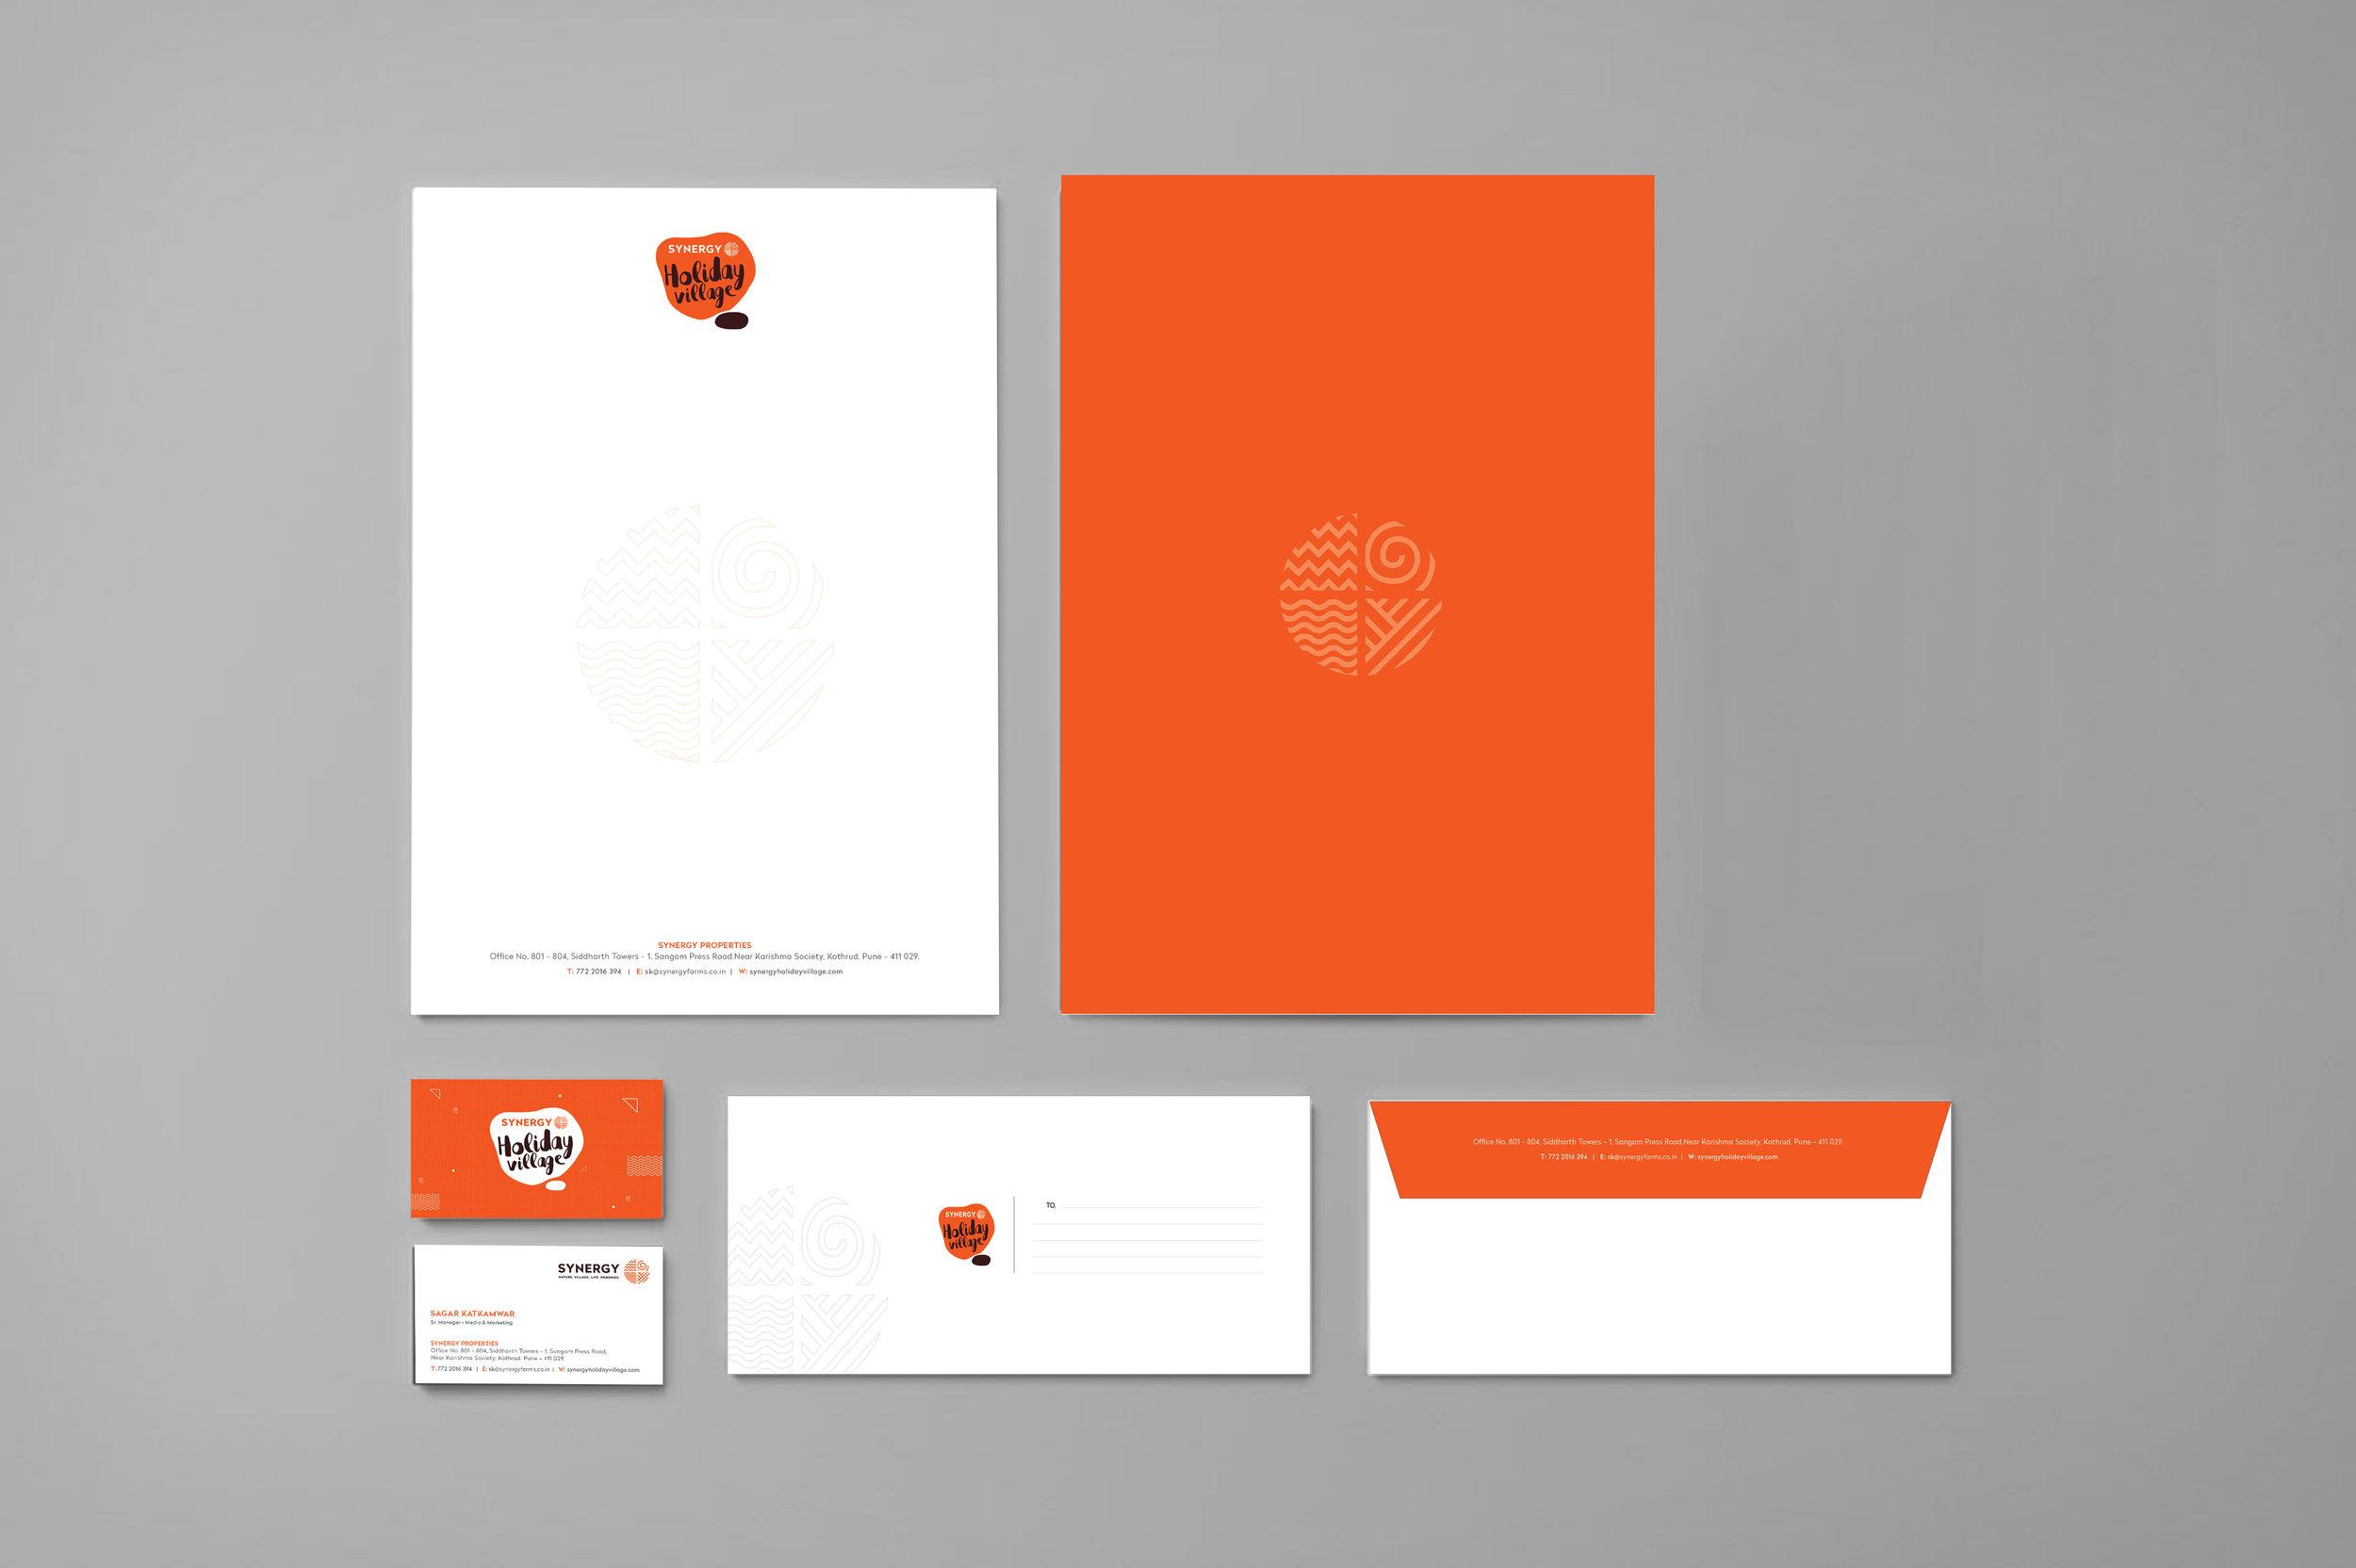 classic-stationery-and-branding-mockup-1.jpg